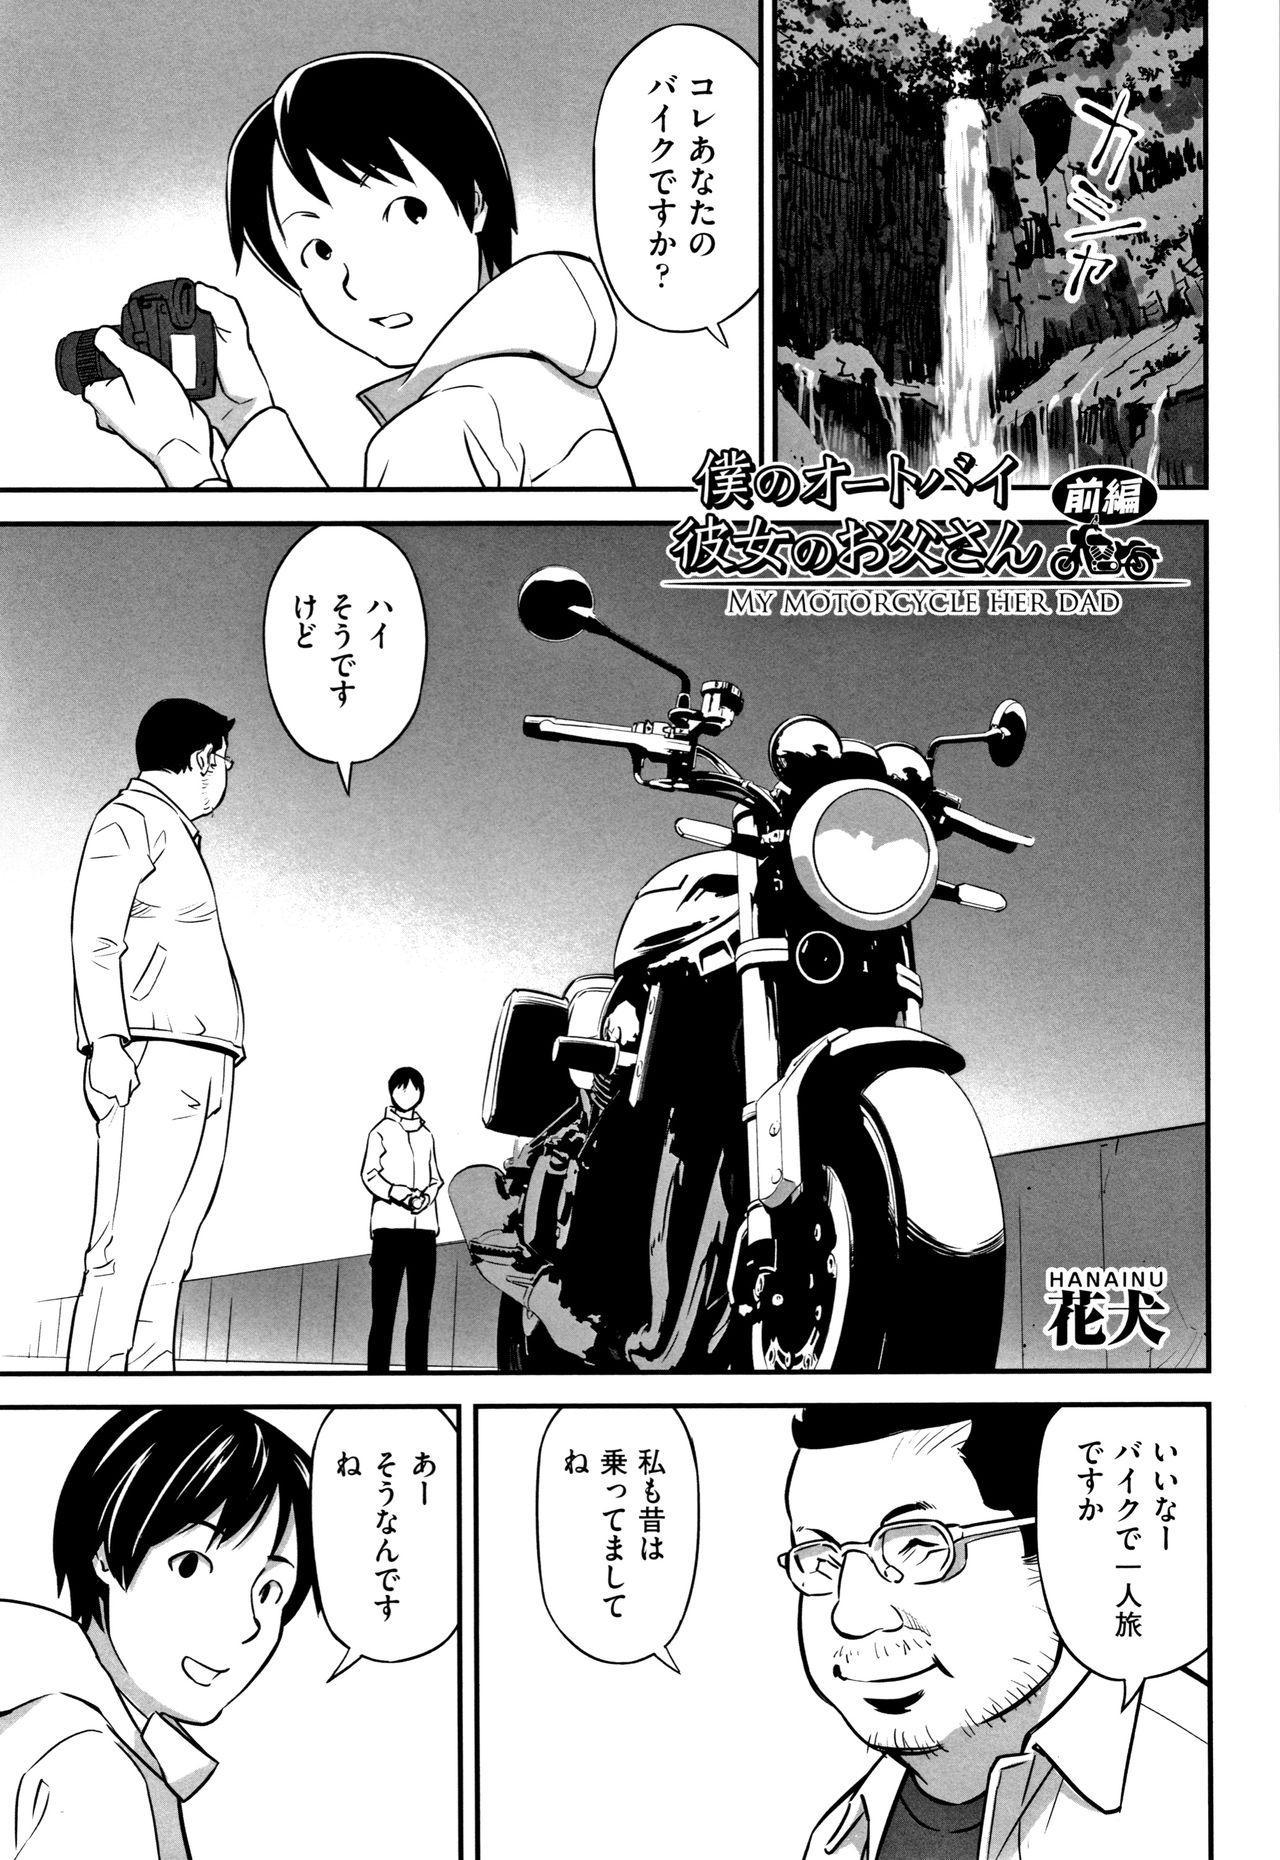 Shoujo Kumikyoku 11 151